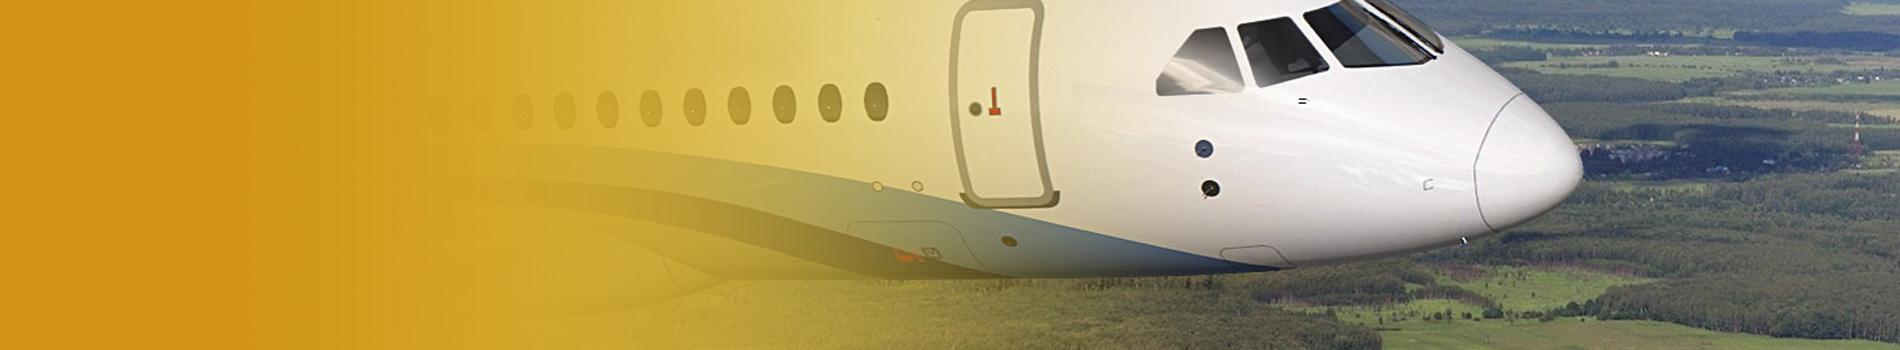 header cabecera aereo air